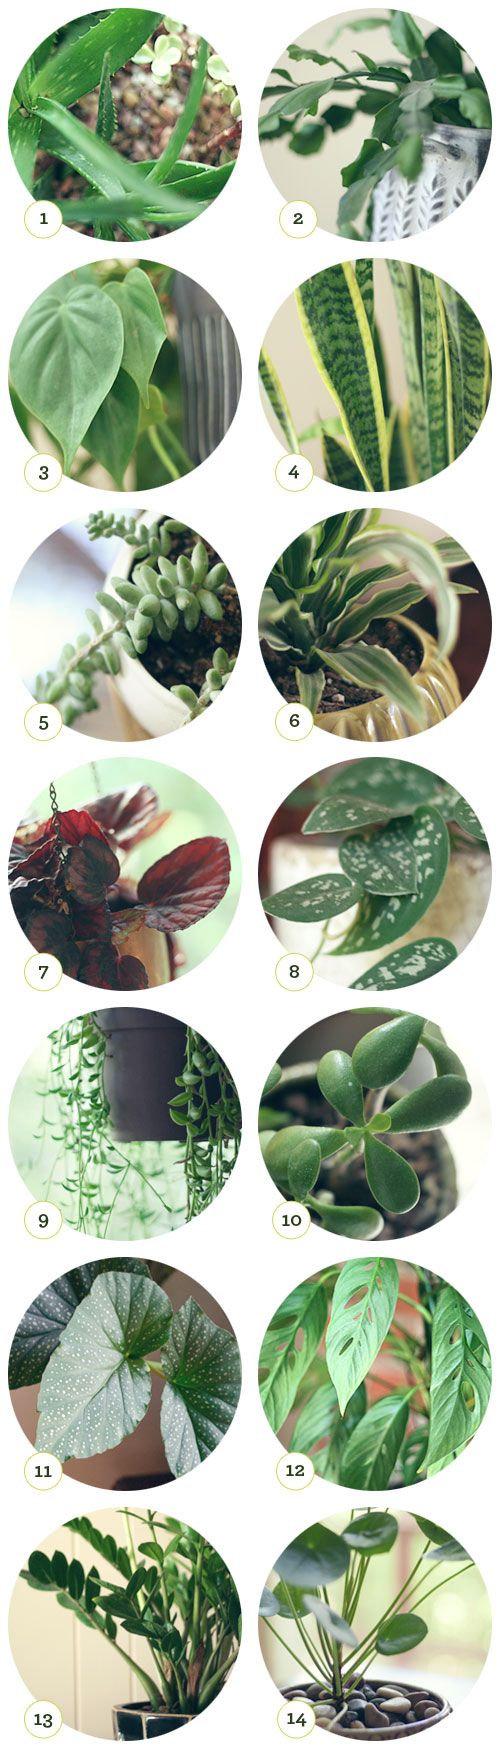 House plant identification banana plants jade and wings - House plant identification guide by picture ...